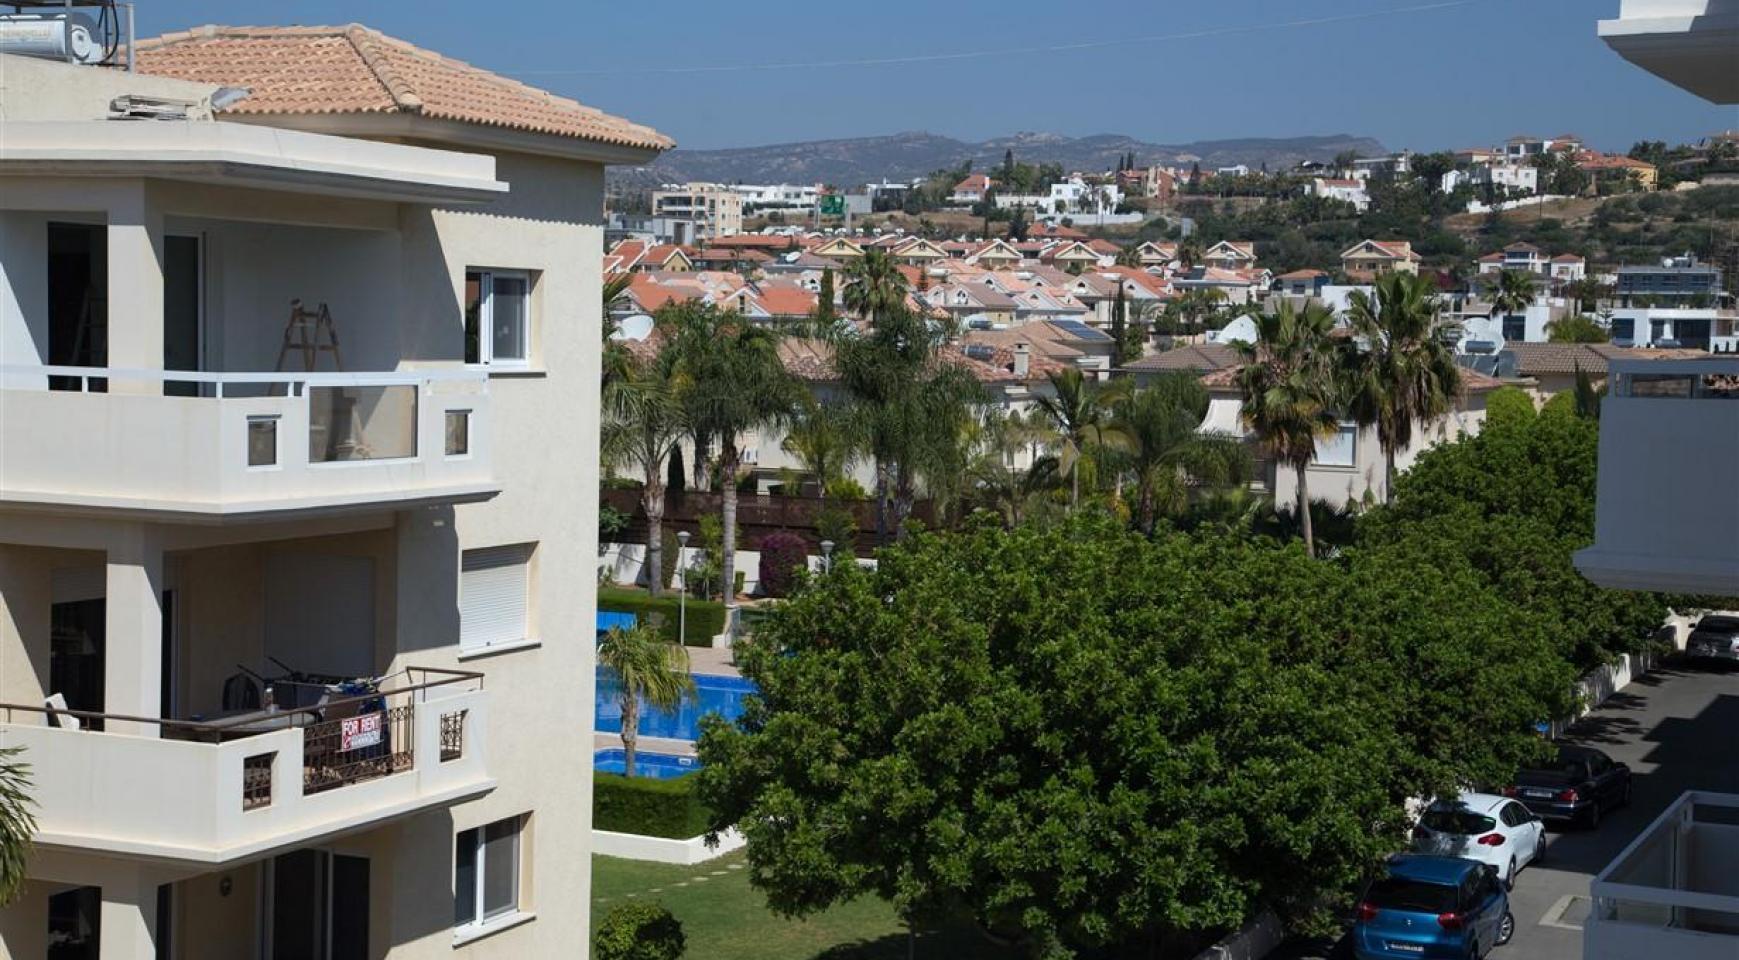 Luxury 2 Bedroom Apartment Mesogios Iris 304 in the Tourist area near the Beach - 46